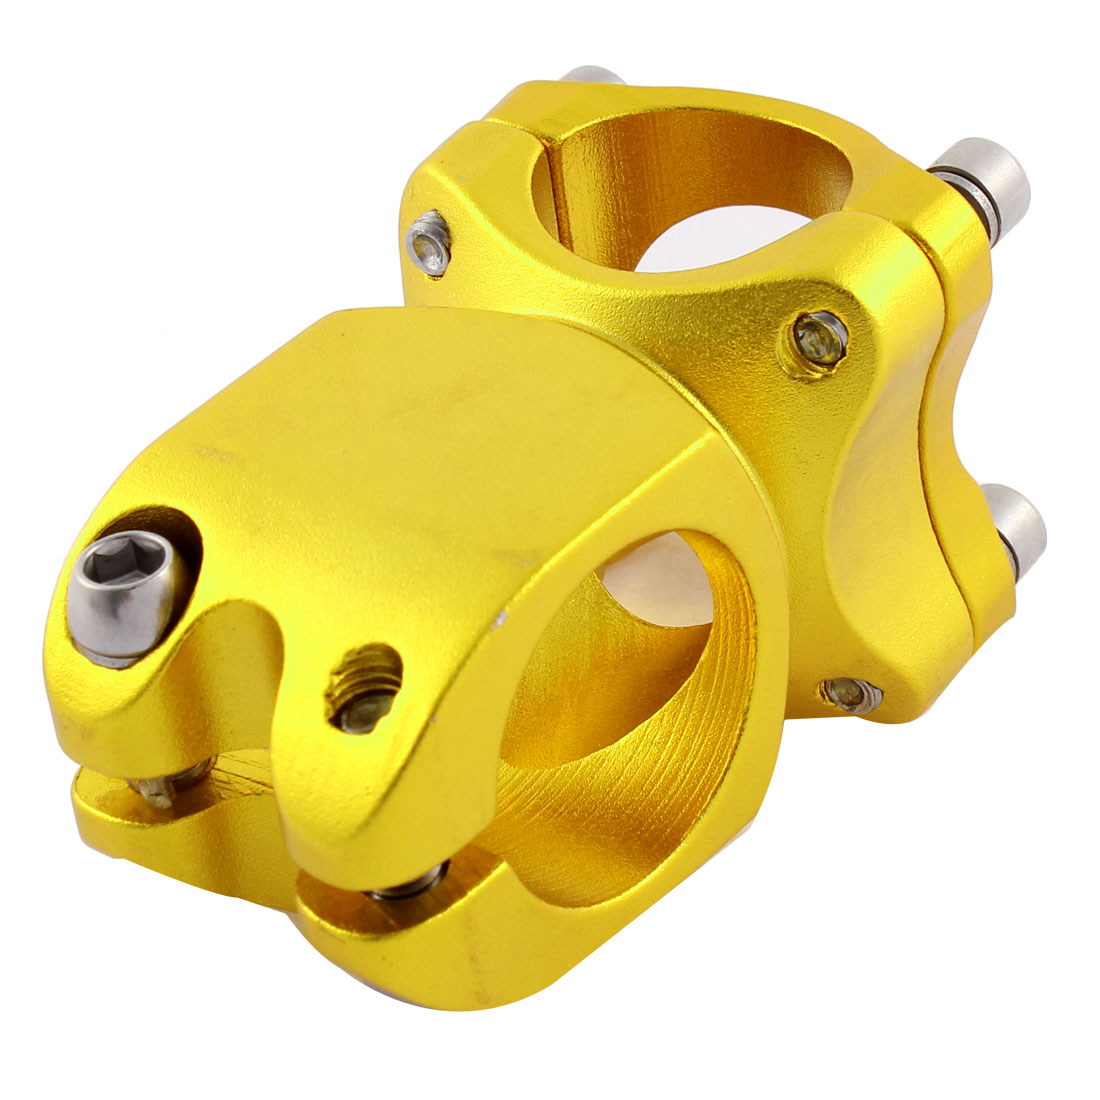 25.4mm x 32mm MTB Road Cycling Bicycle Bike Handlebar Stem Gold Tone